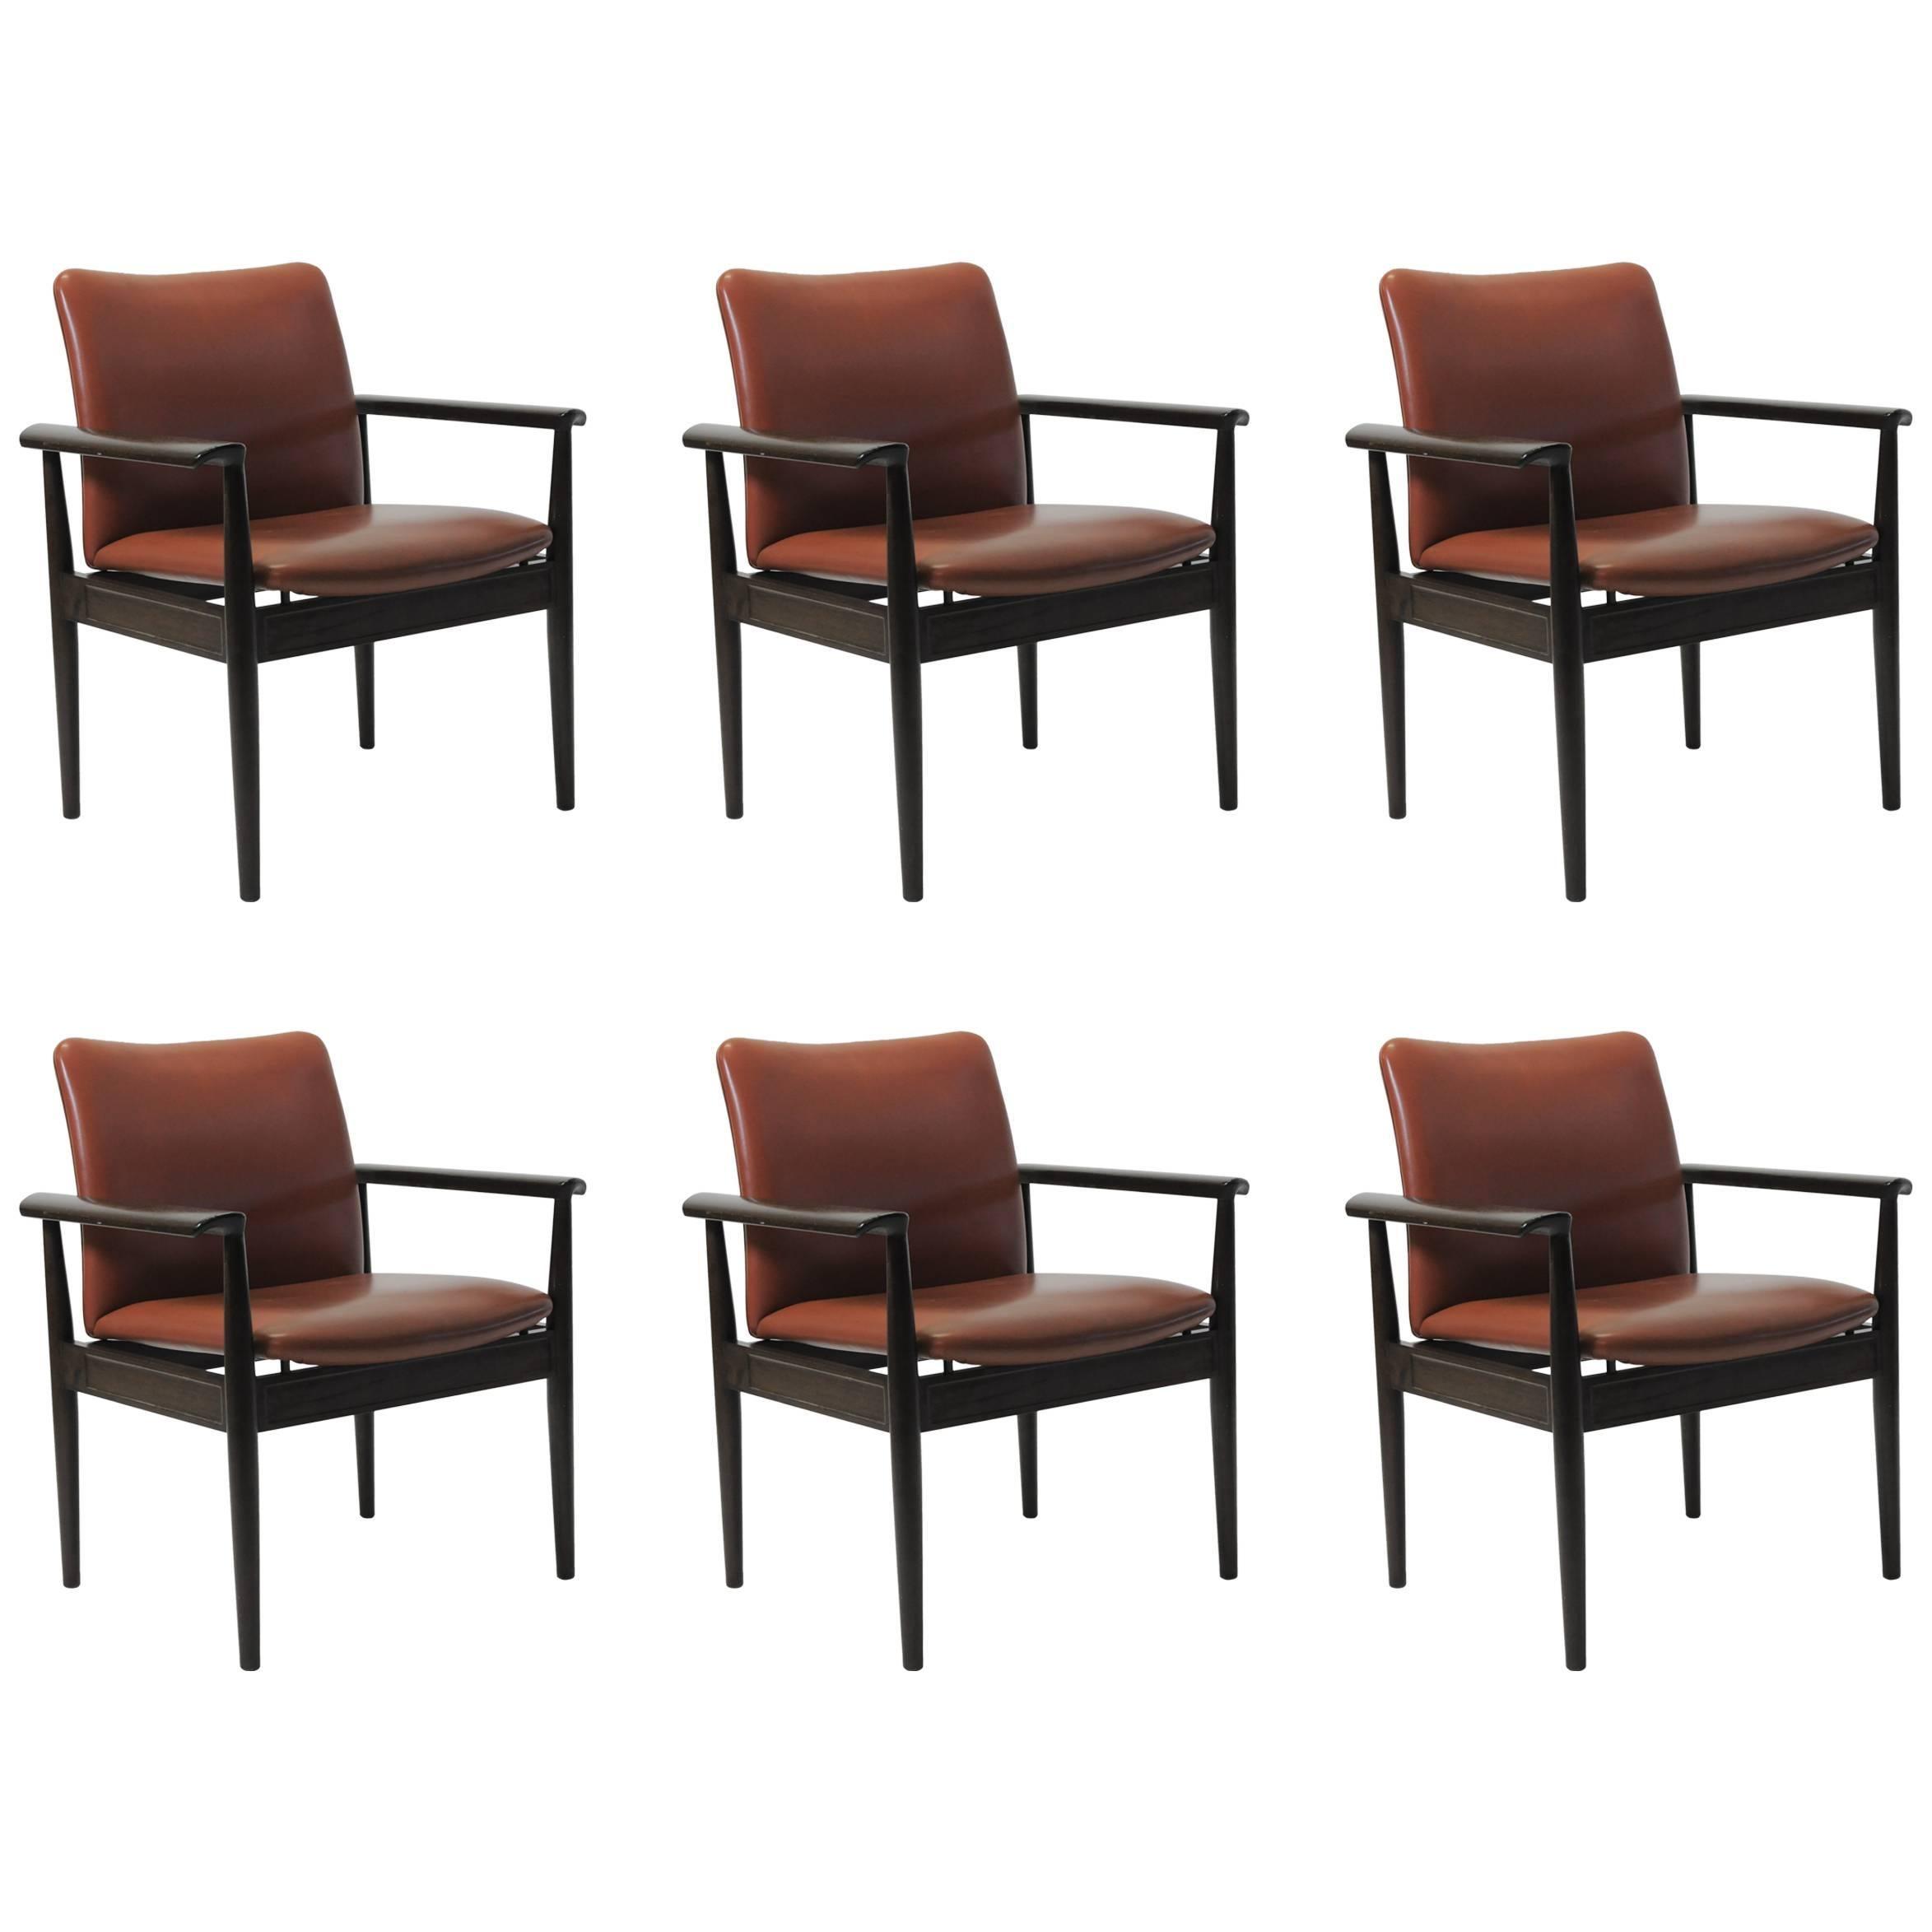 1960s Finn Juhl Six Model 209 Diplomat Chairs in Mahogany and Leather, Cado